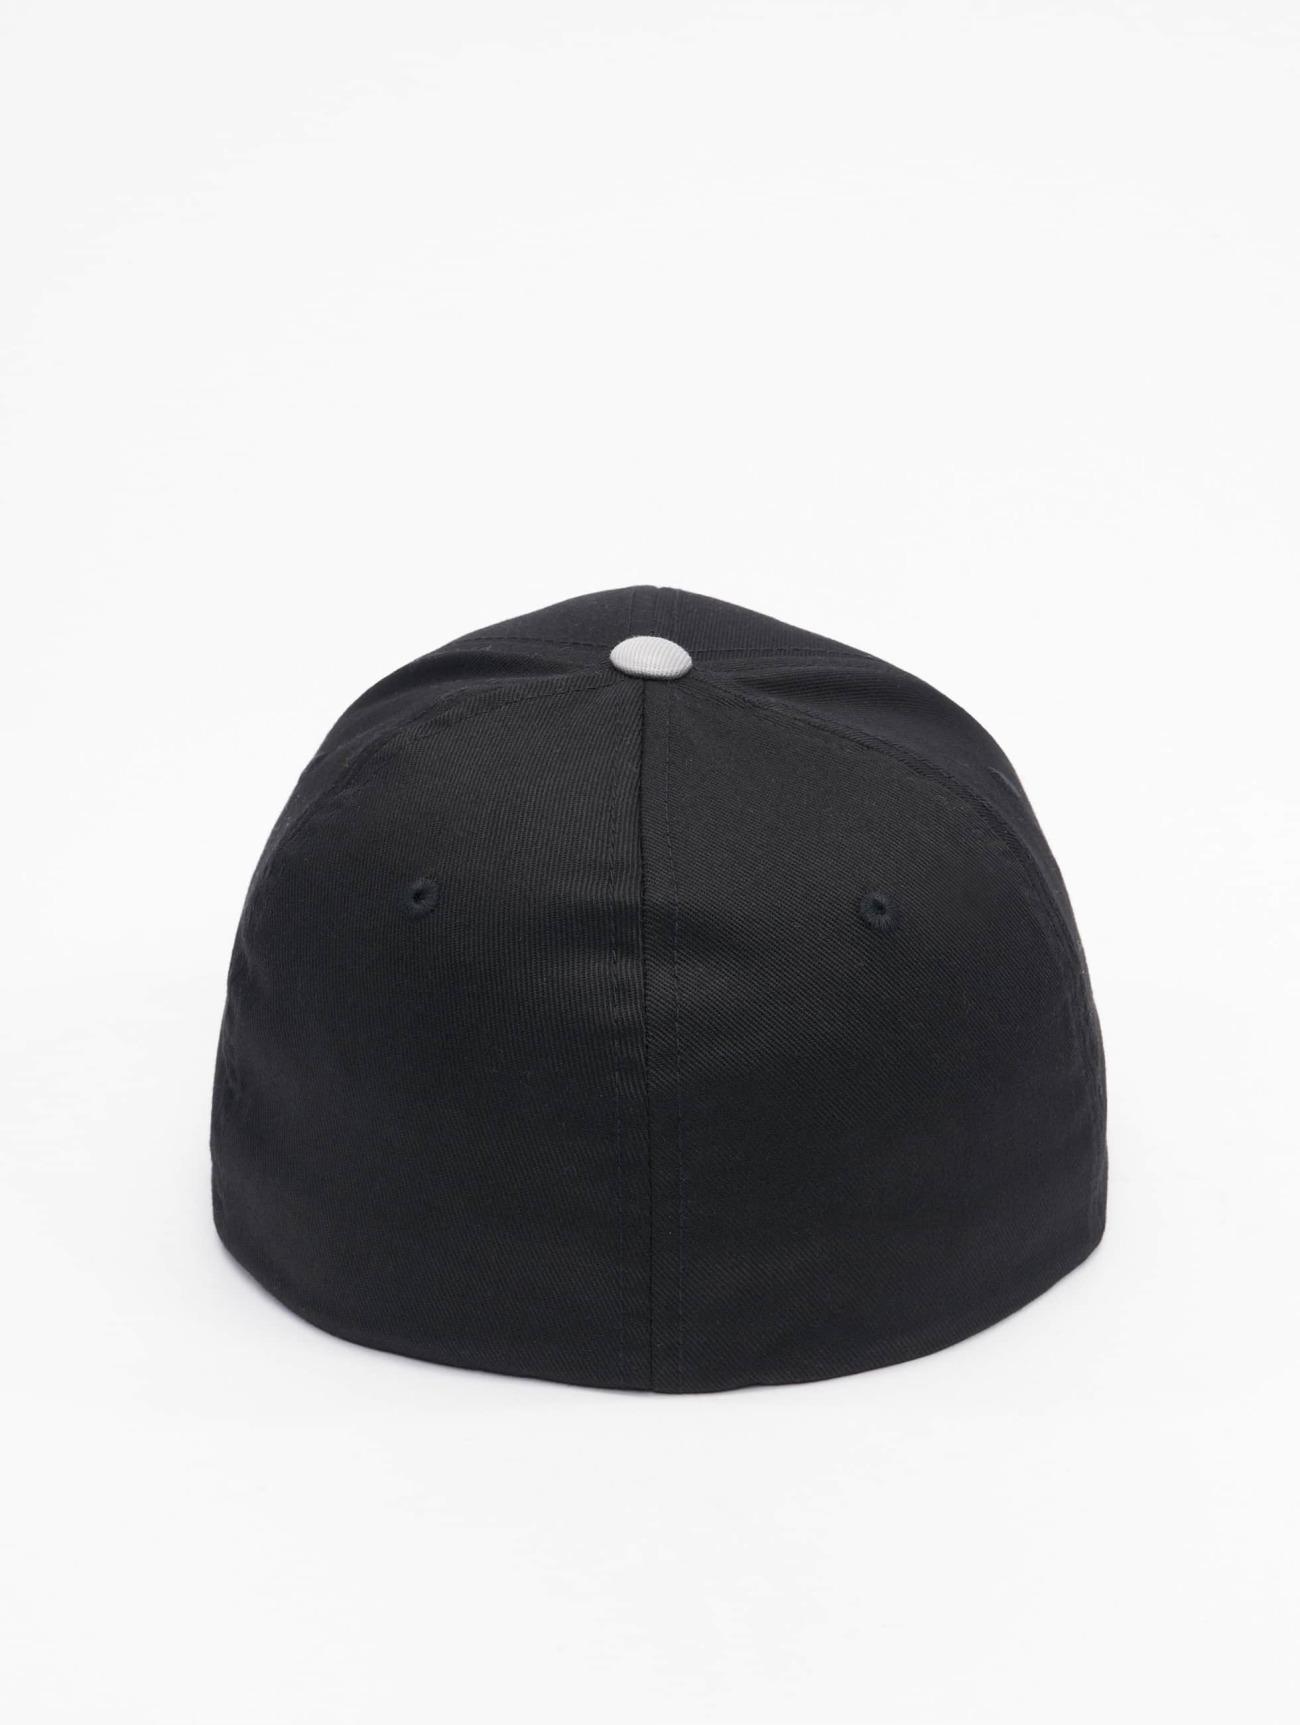 Flexfit  2-Tone Wooly Combed  noir  Casquette Flex Fitted  496039 Homme Casquettes